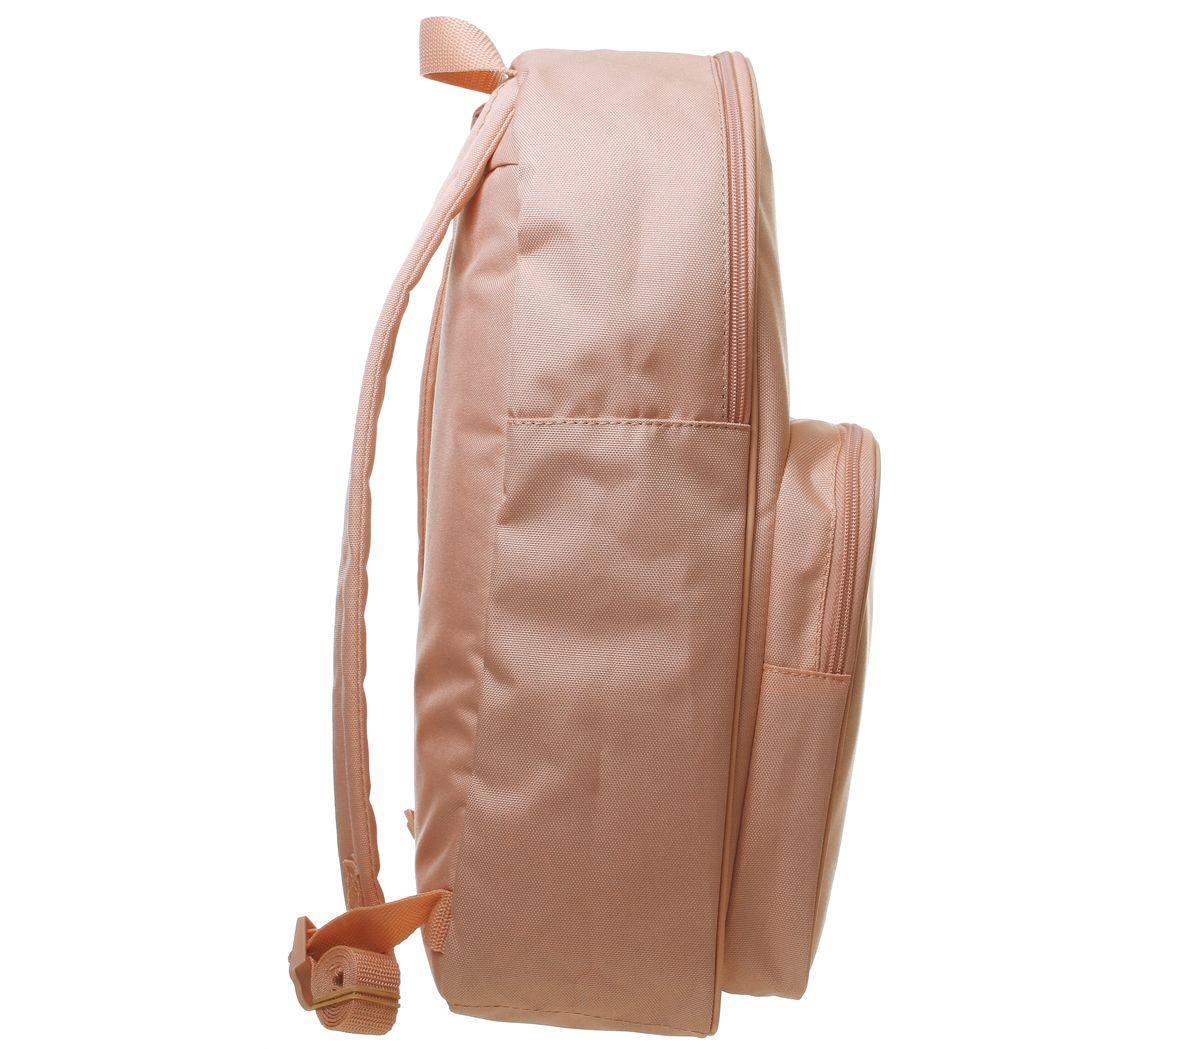 Detalles de Accesorios Adidas clásico Trébol mochilas Polvo Rosa Blanco Accesorios ver título original